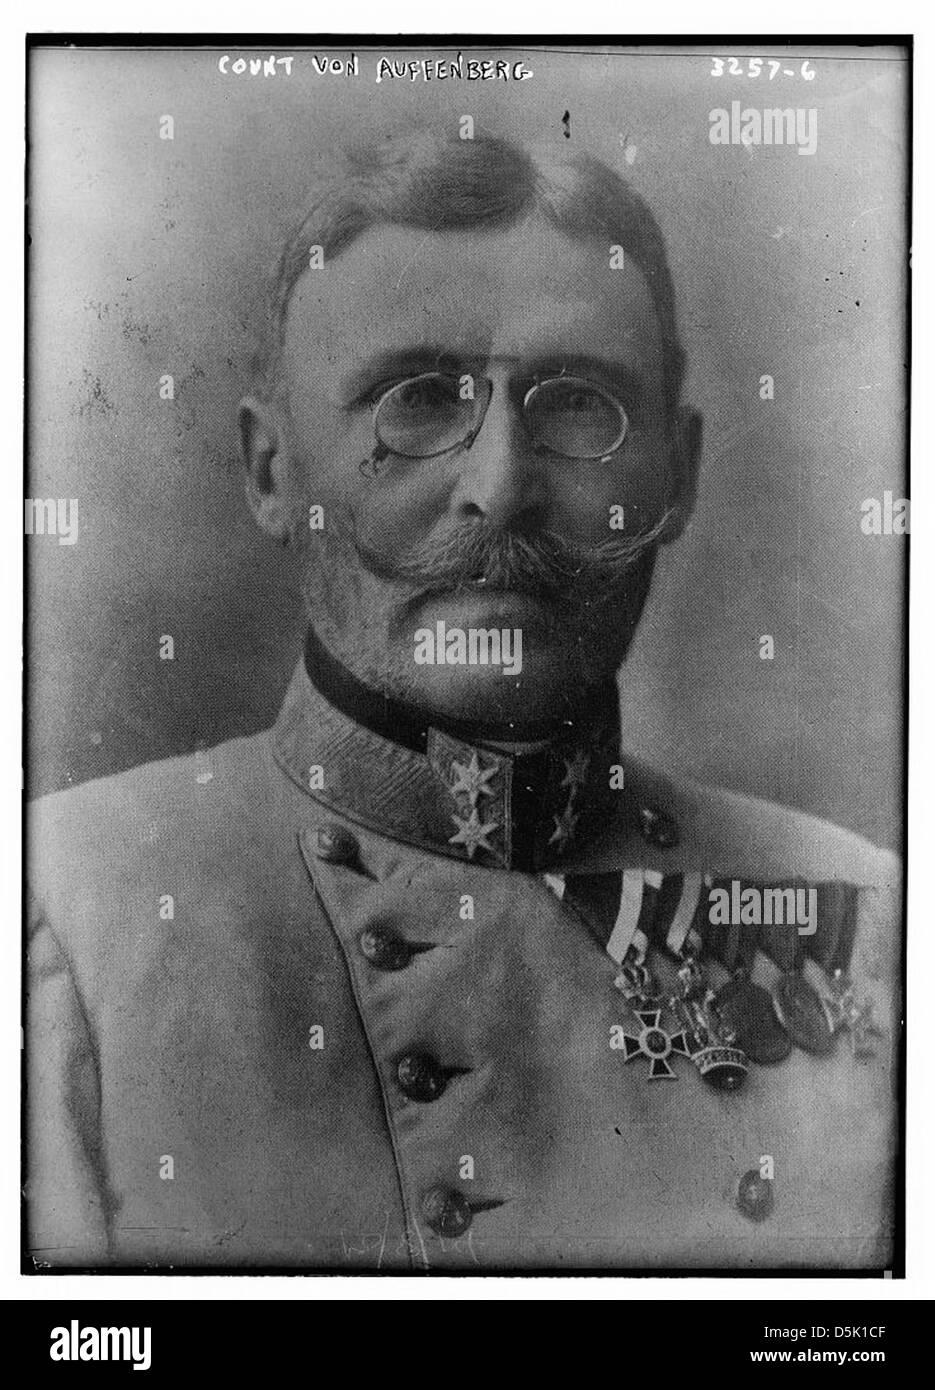 Count Von Auffenberg (LOC) - Stock Image